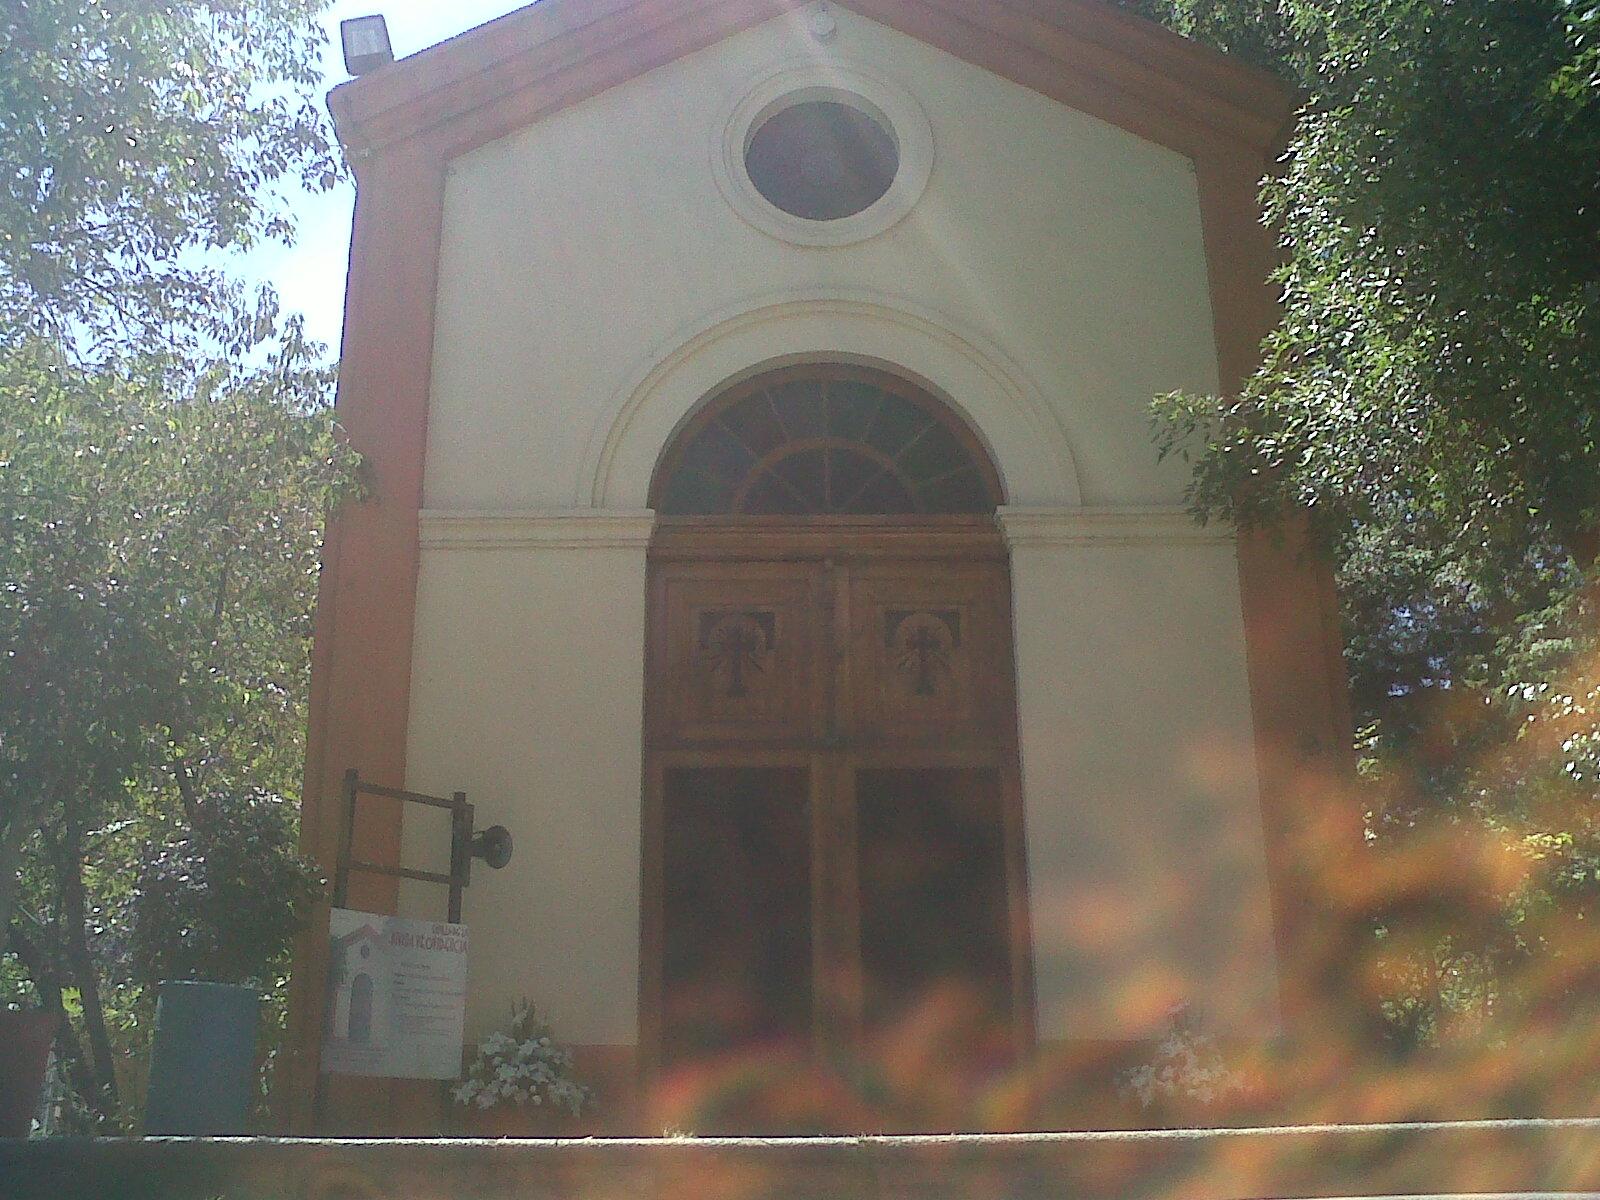 mex-capilla-capilla-divina-providencia-inside-pena-pobre-mall-oct12